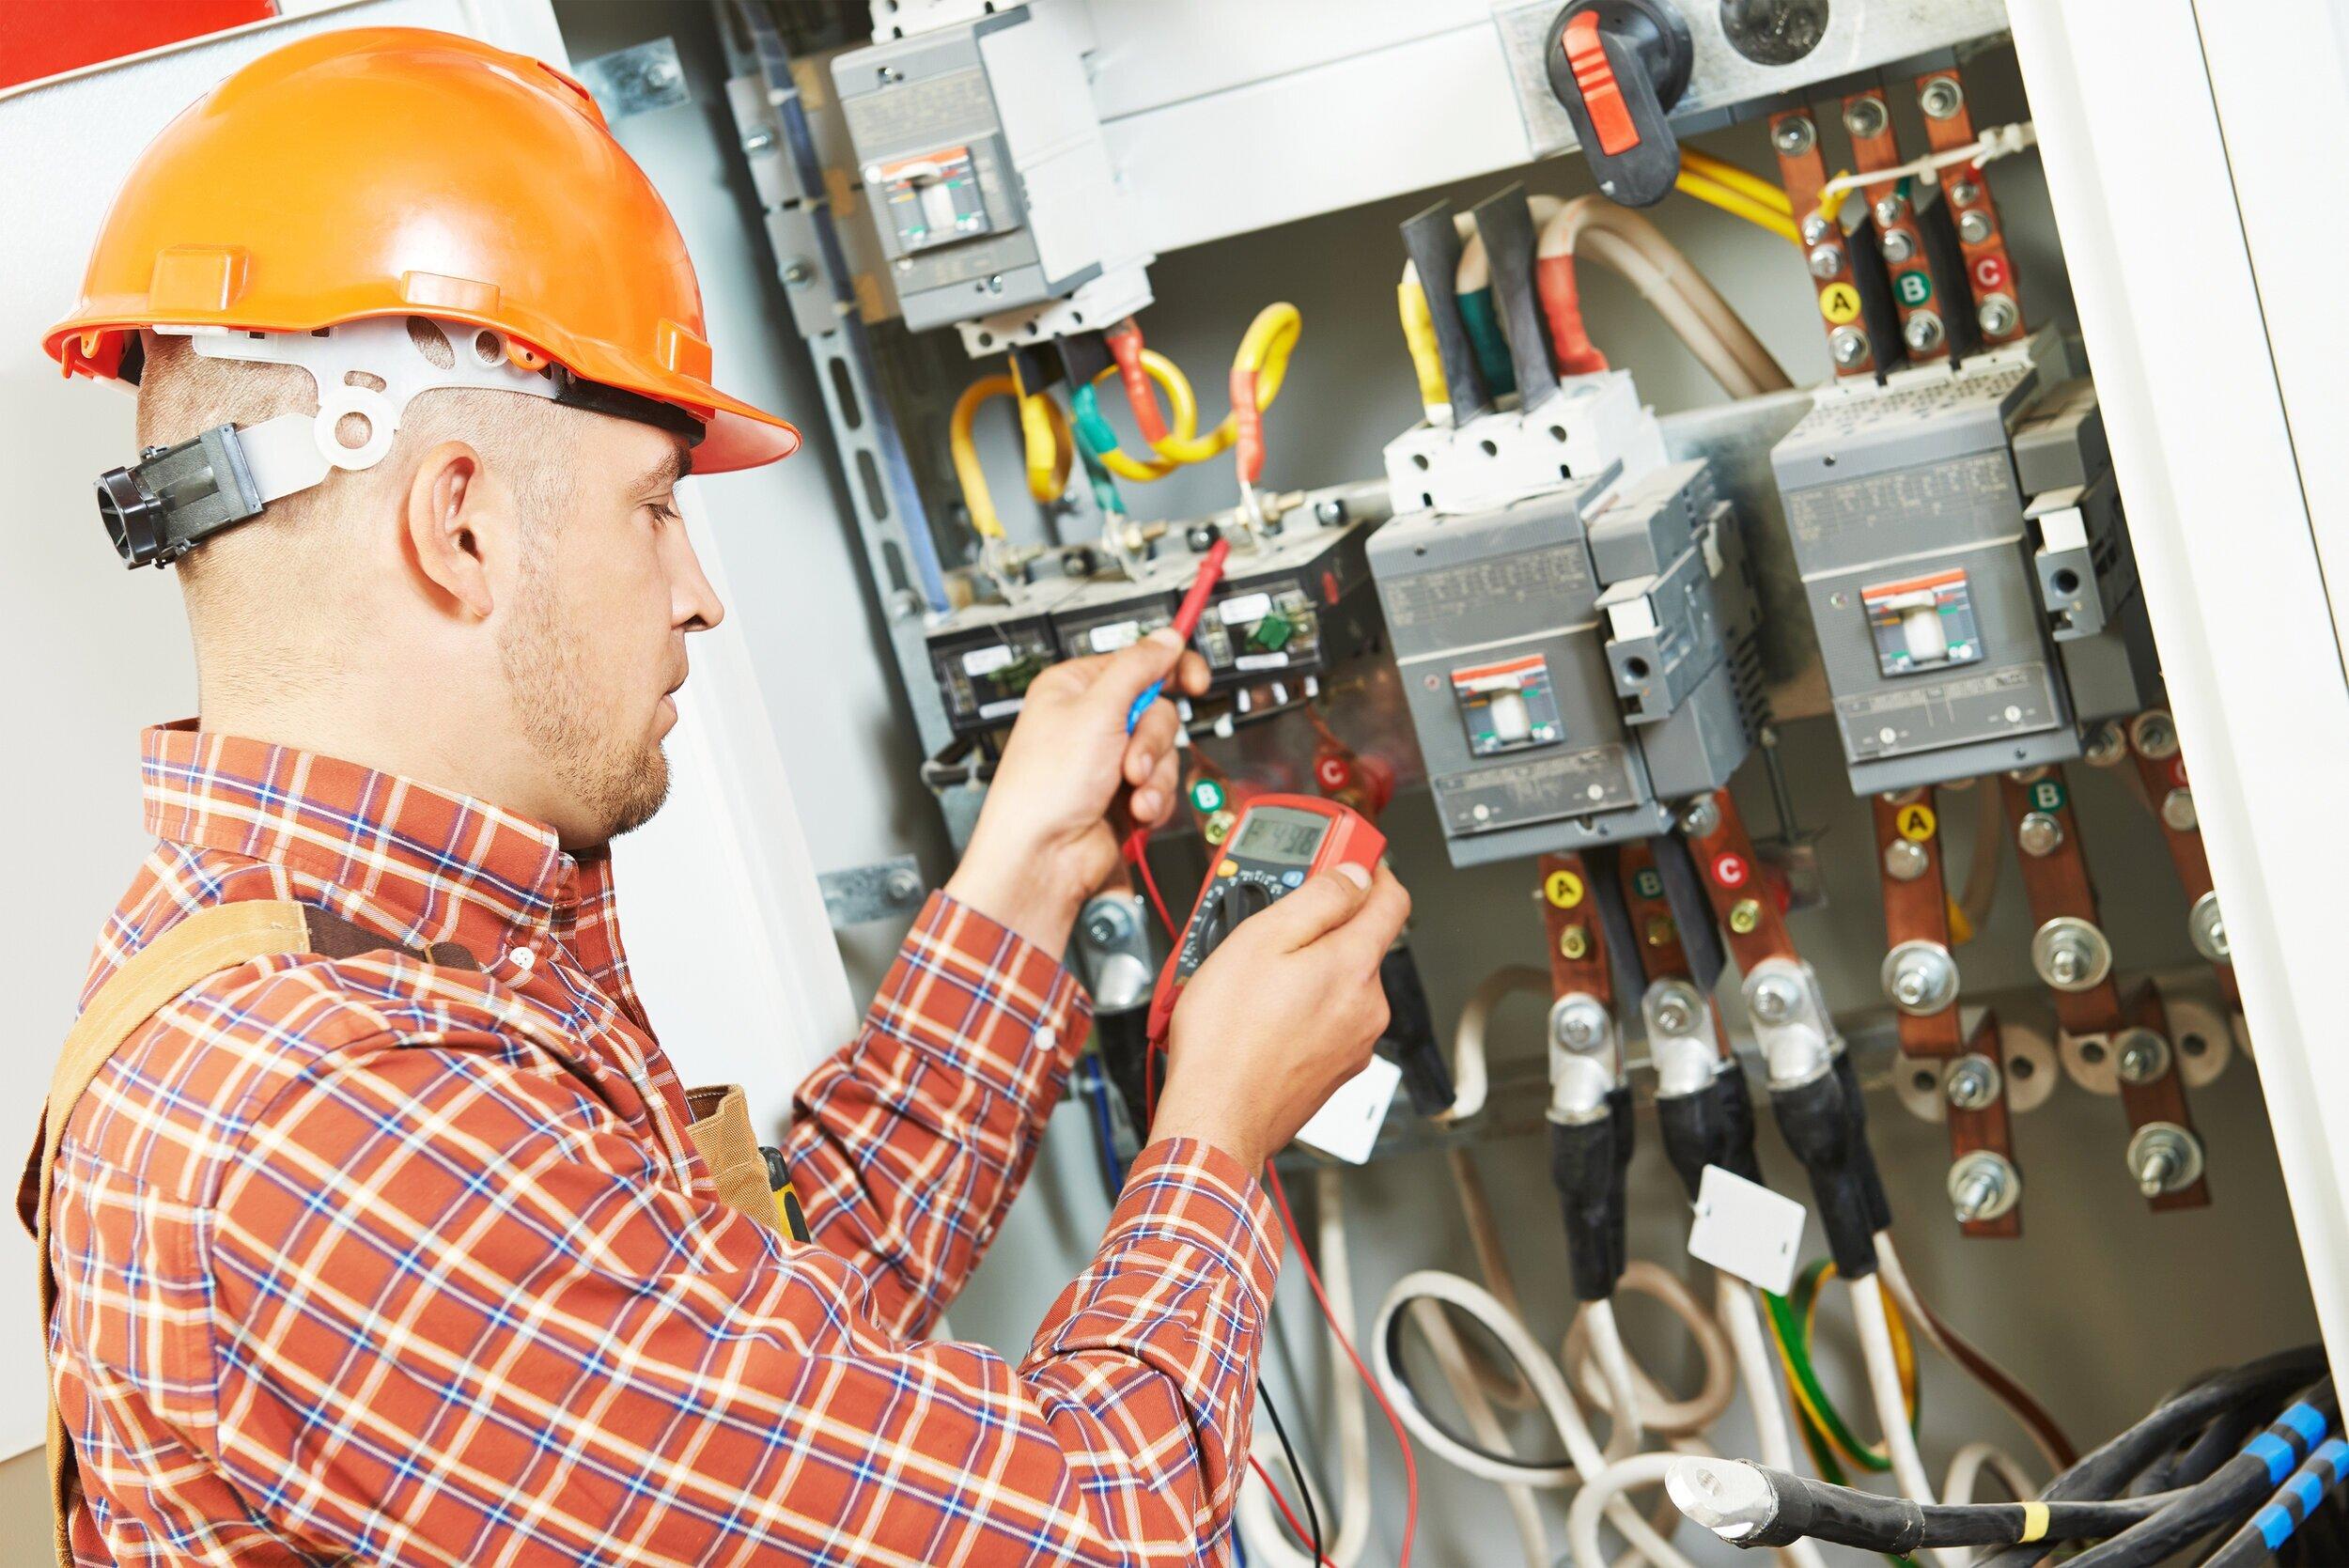 bigstock-adult-electrician-builder-engi-94395905.jpg